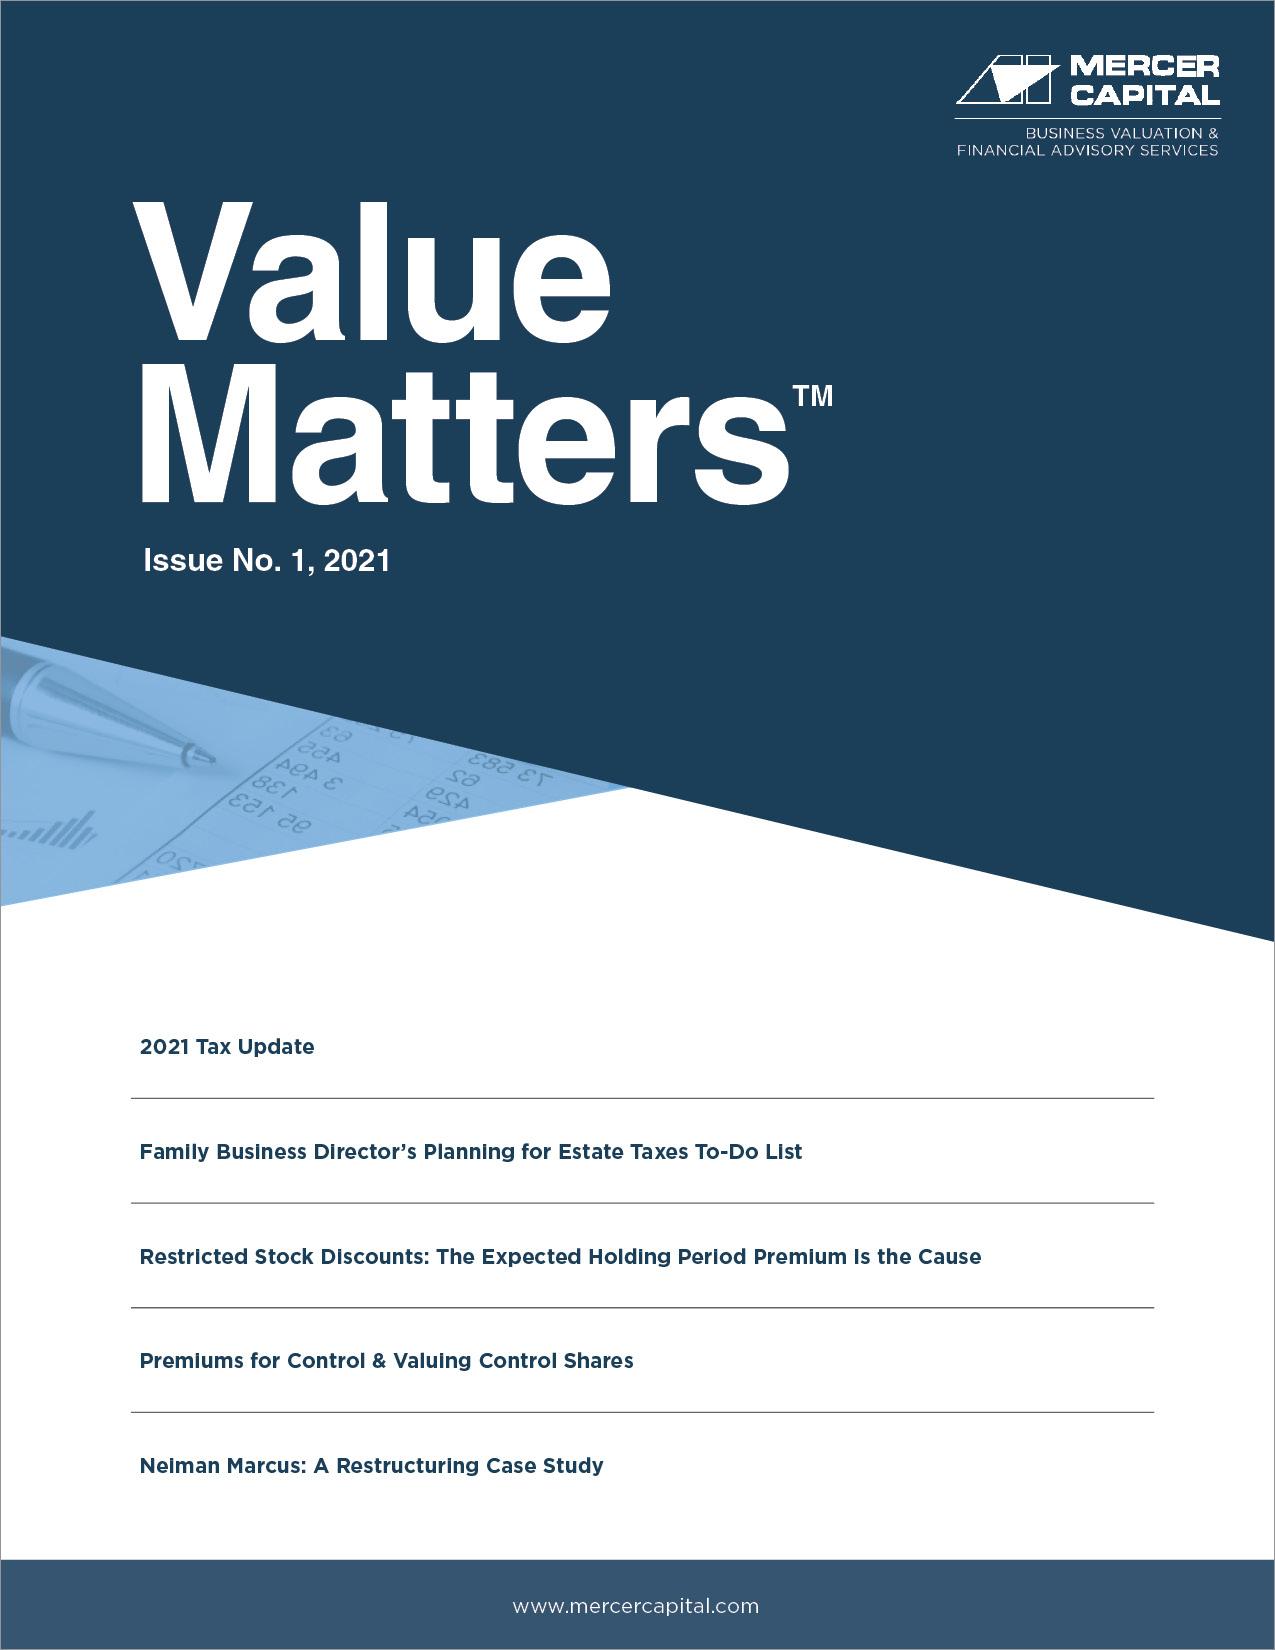 http://mercercapital.com/content/uploads/2020_04_Value-Matters.pdf